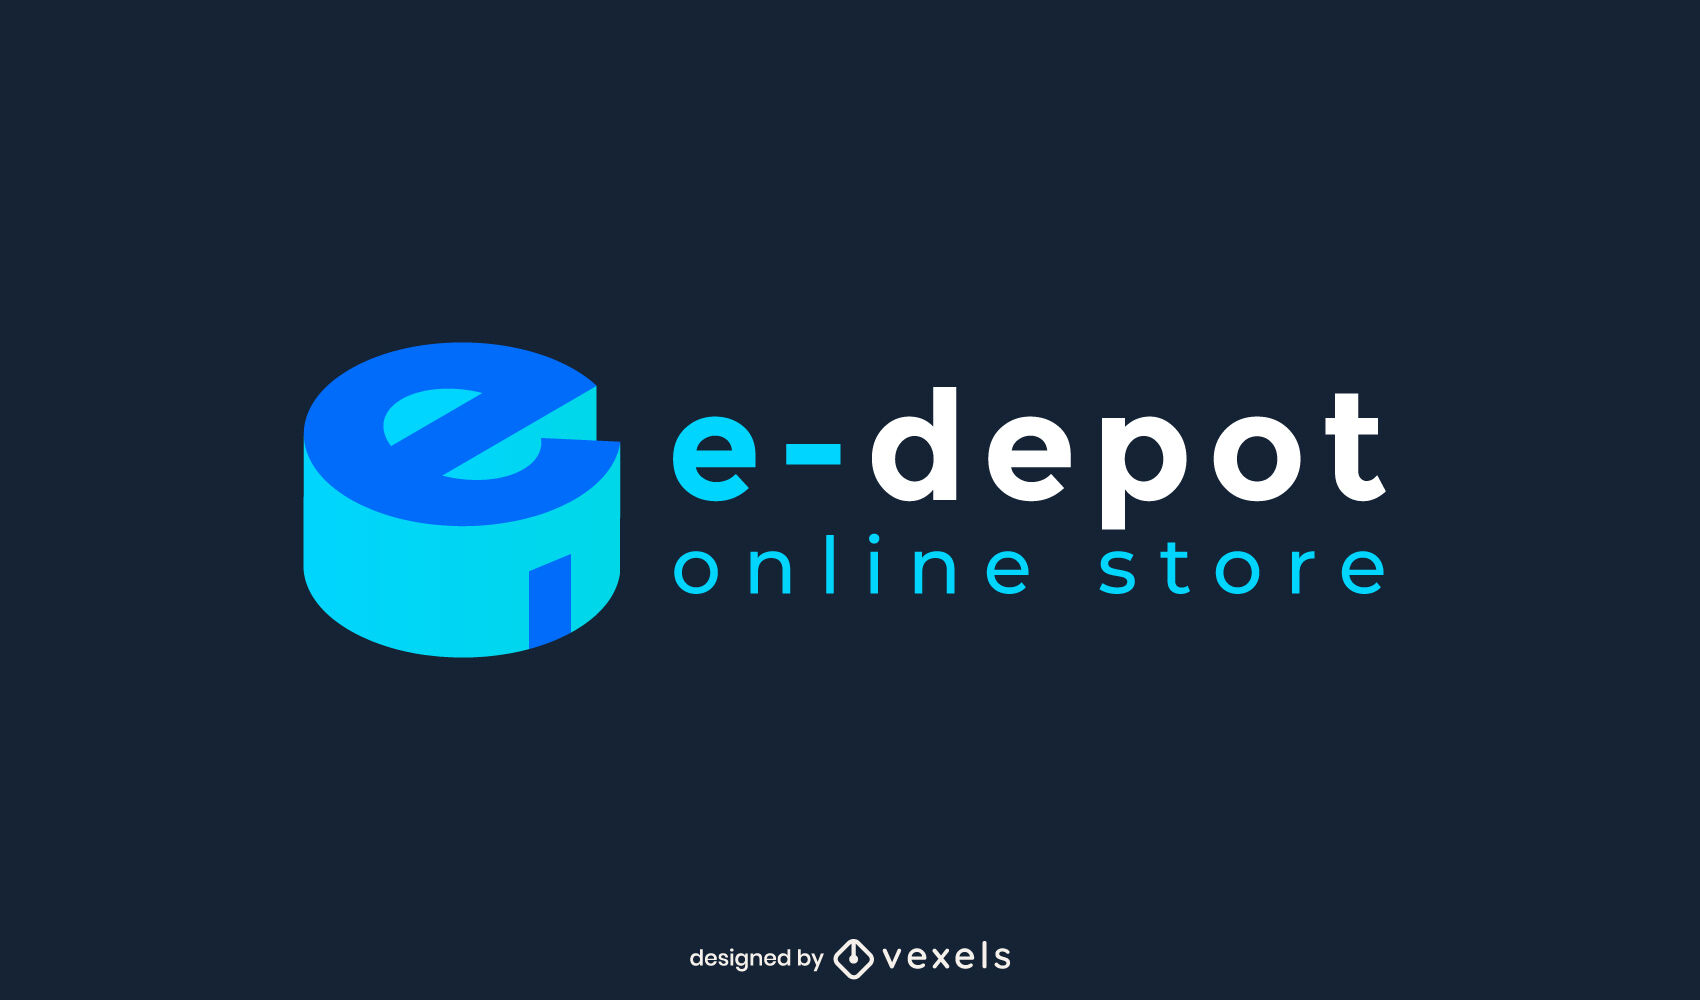 E tienda online logo 3d